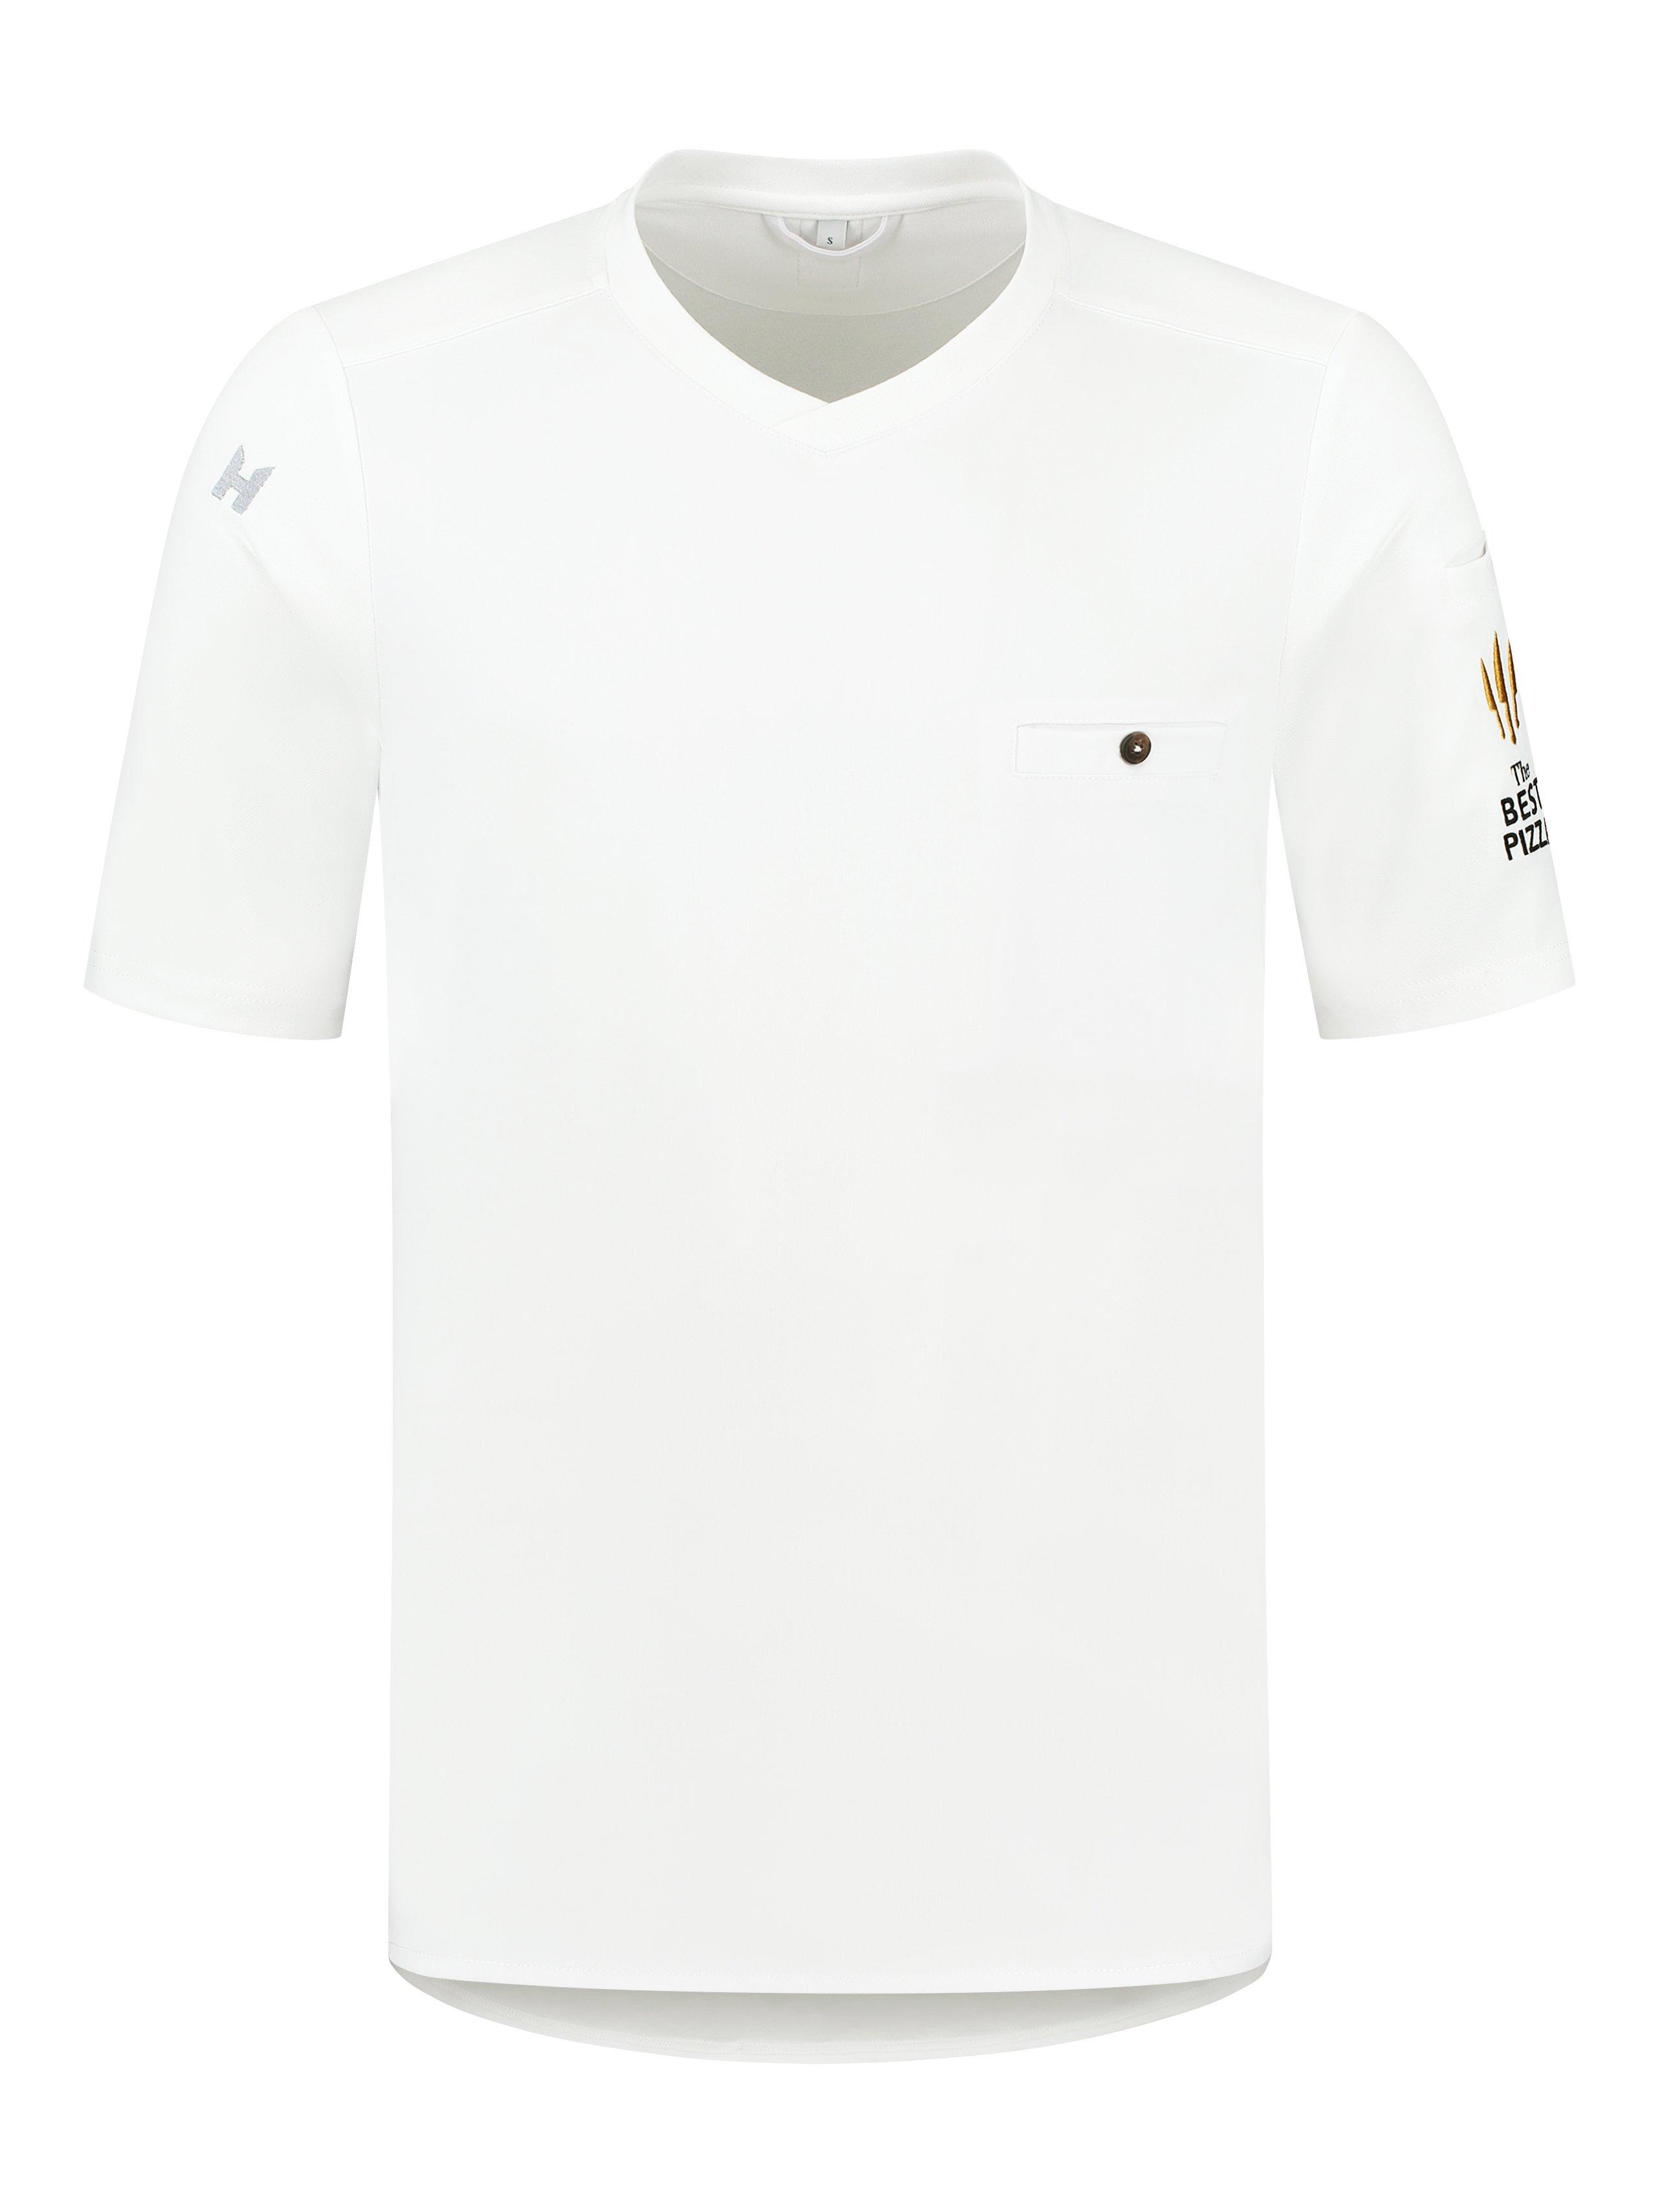 T-Shirt The Best Pizza Ferre White